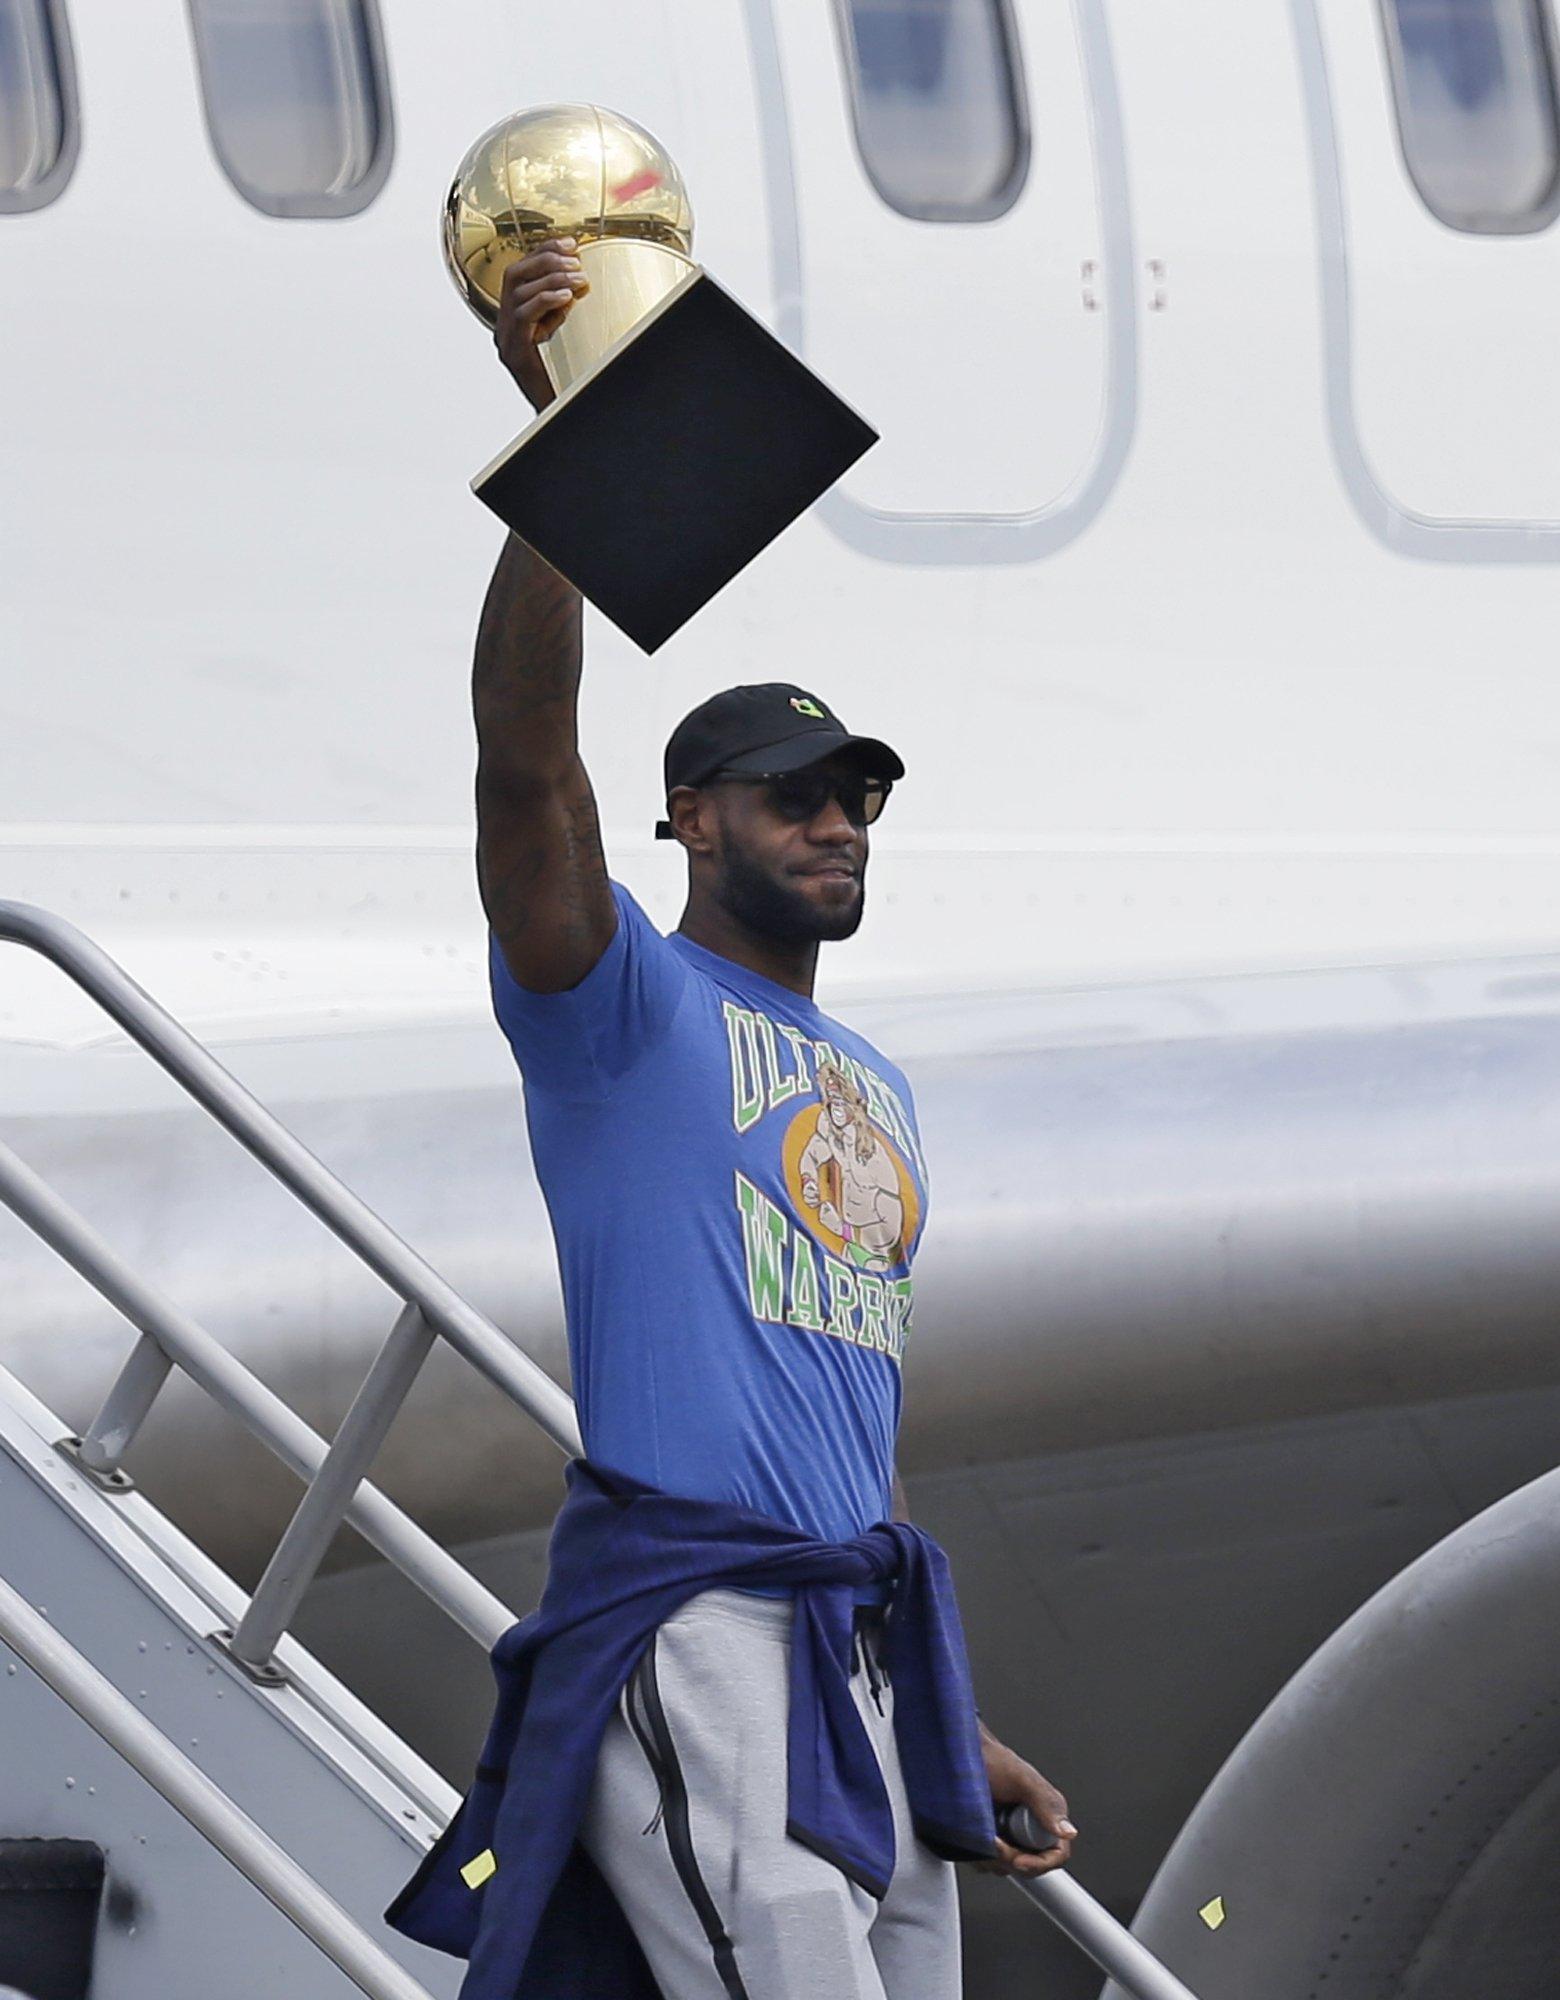 LeBron blasts critics on social media after winning title